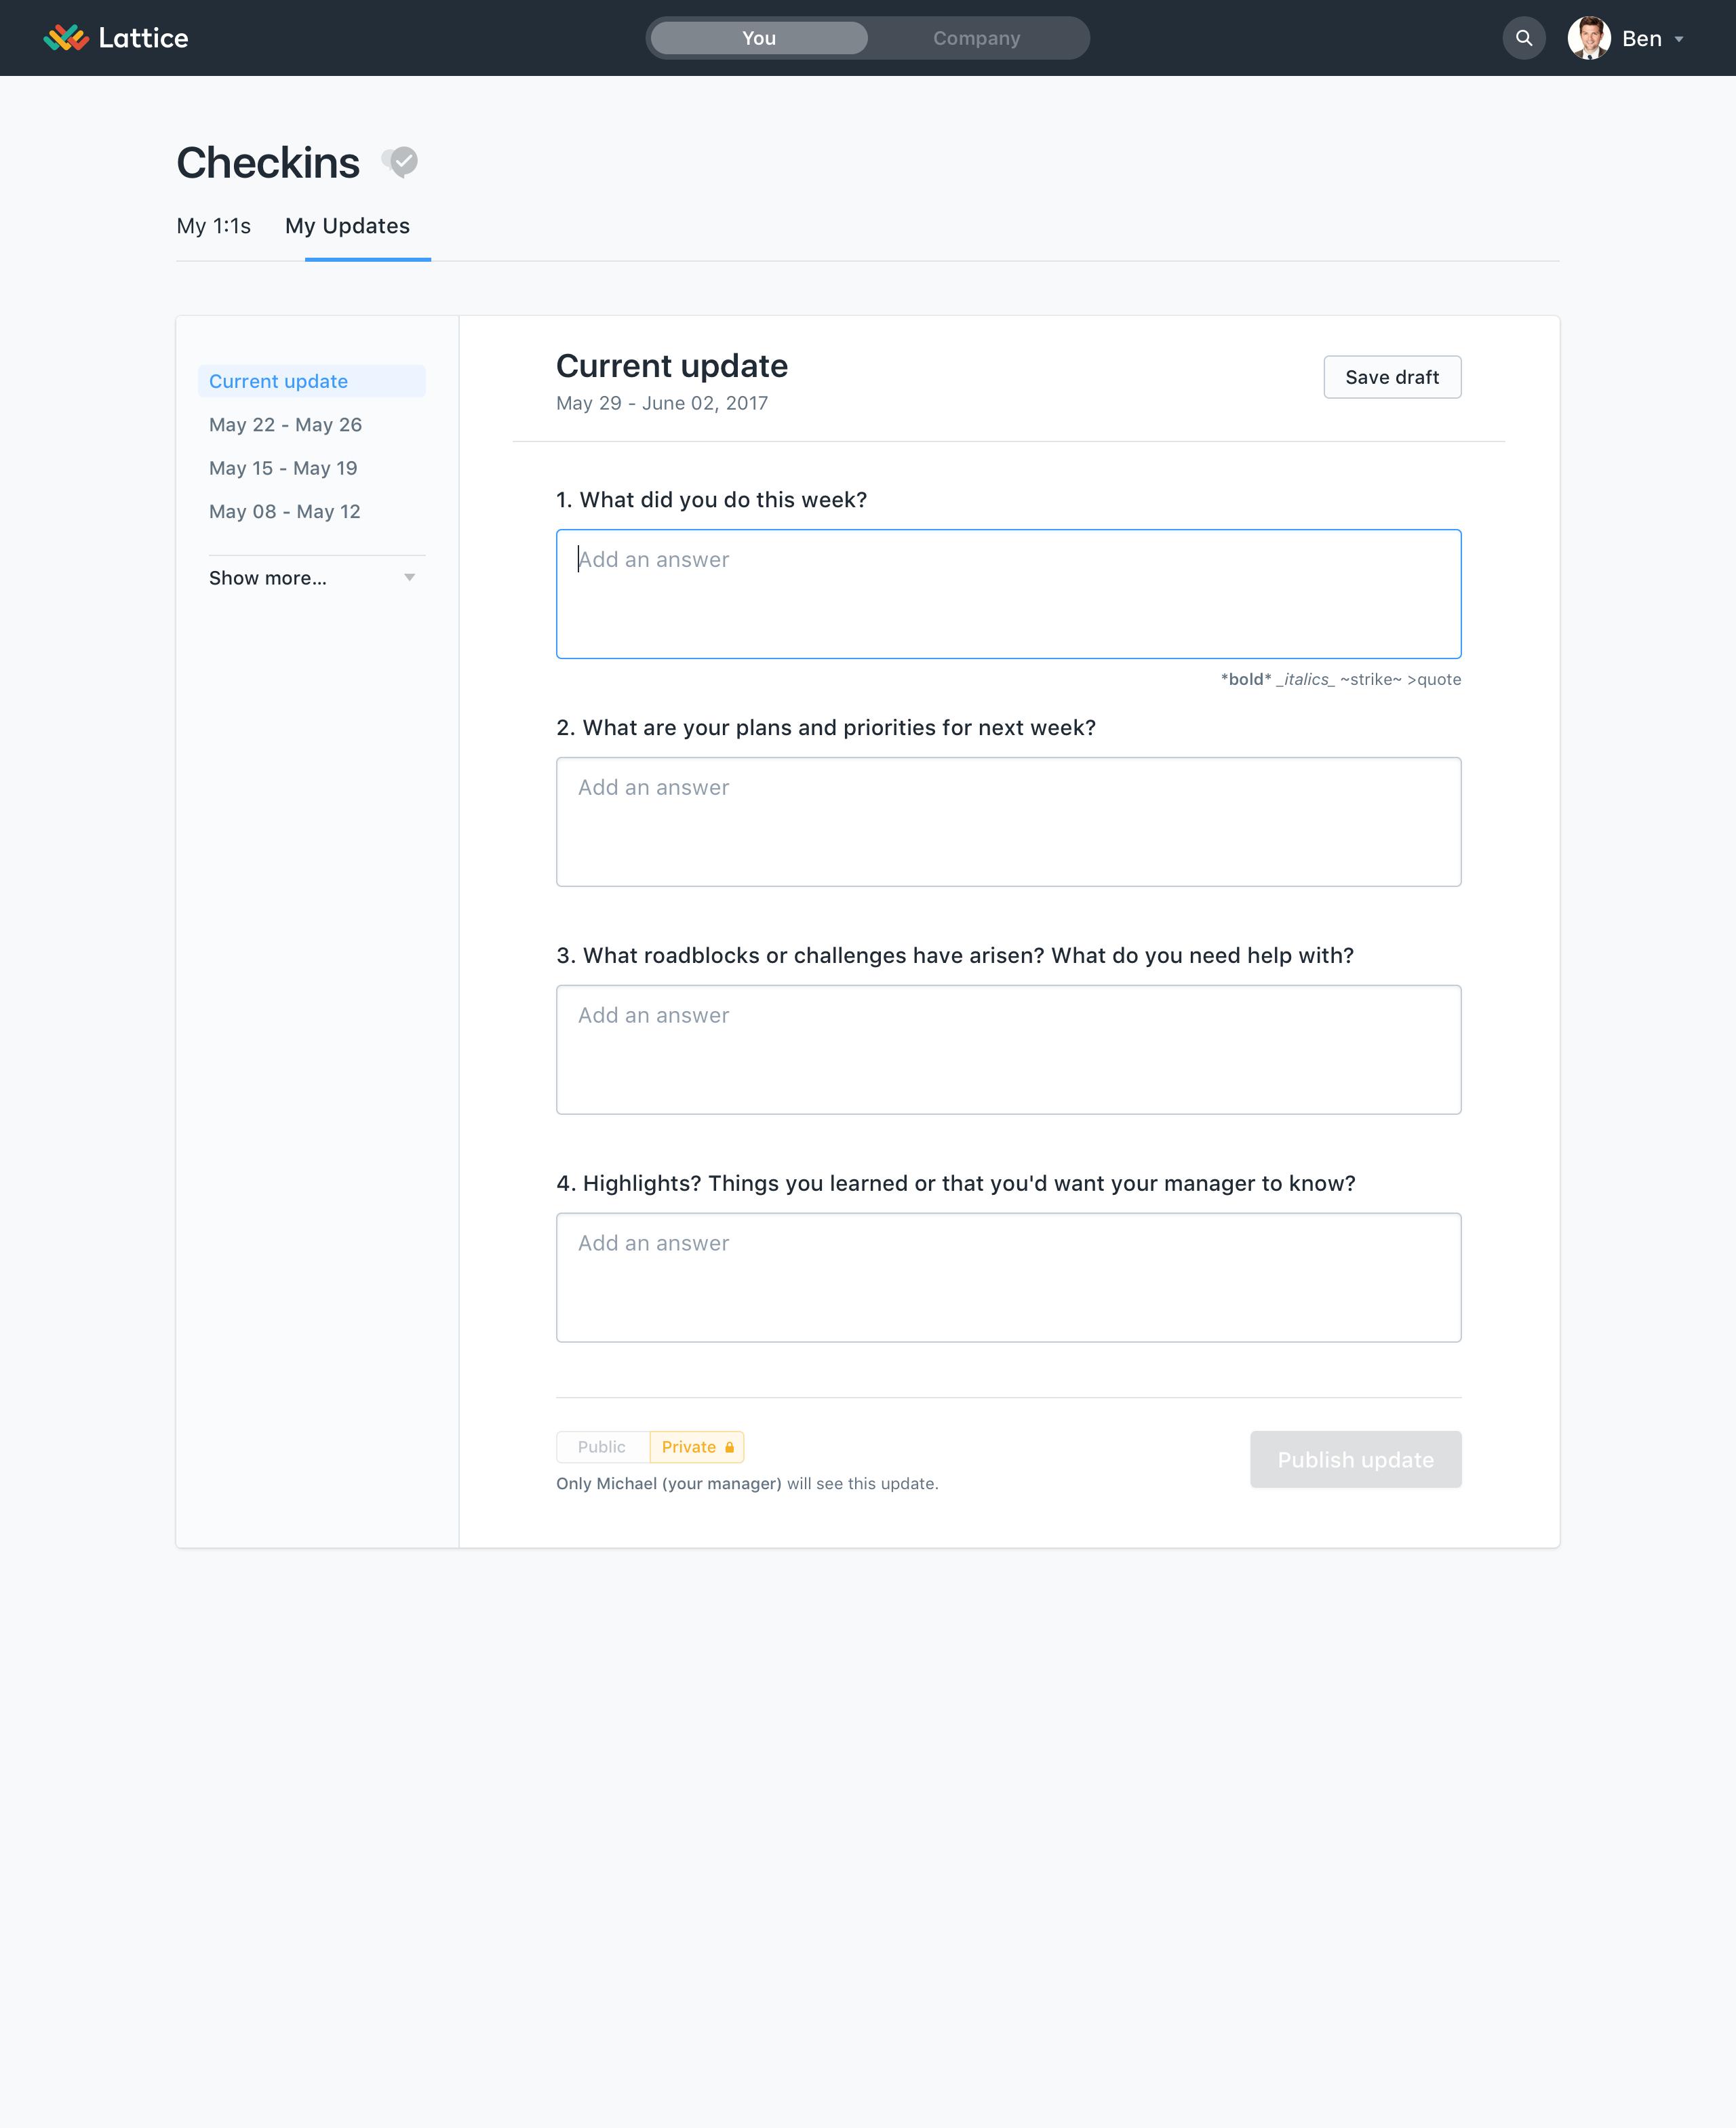 Lattice Performance Management Demo - Lattice Employee Checkin Page